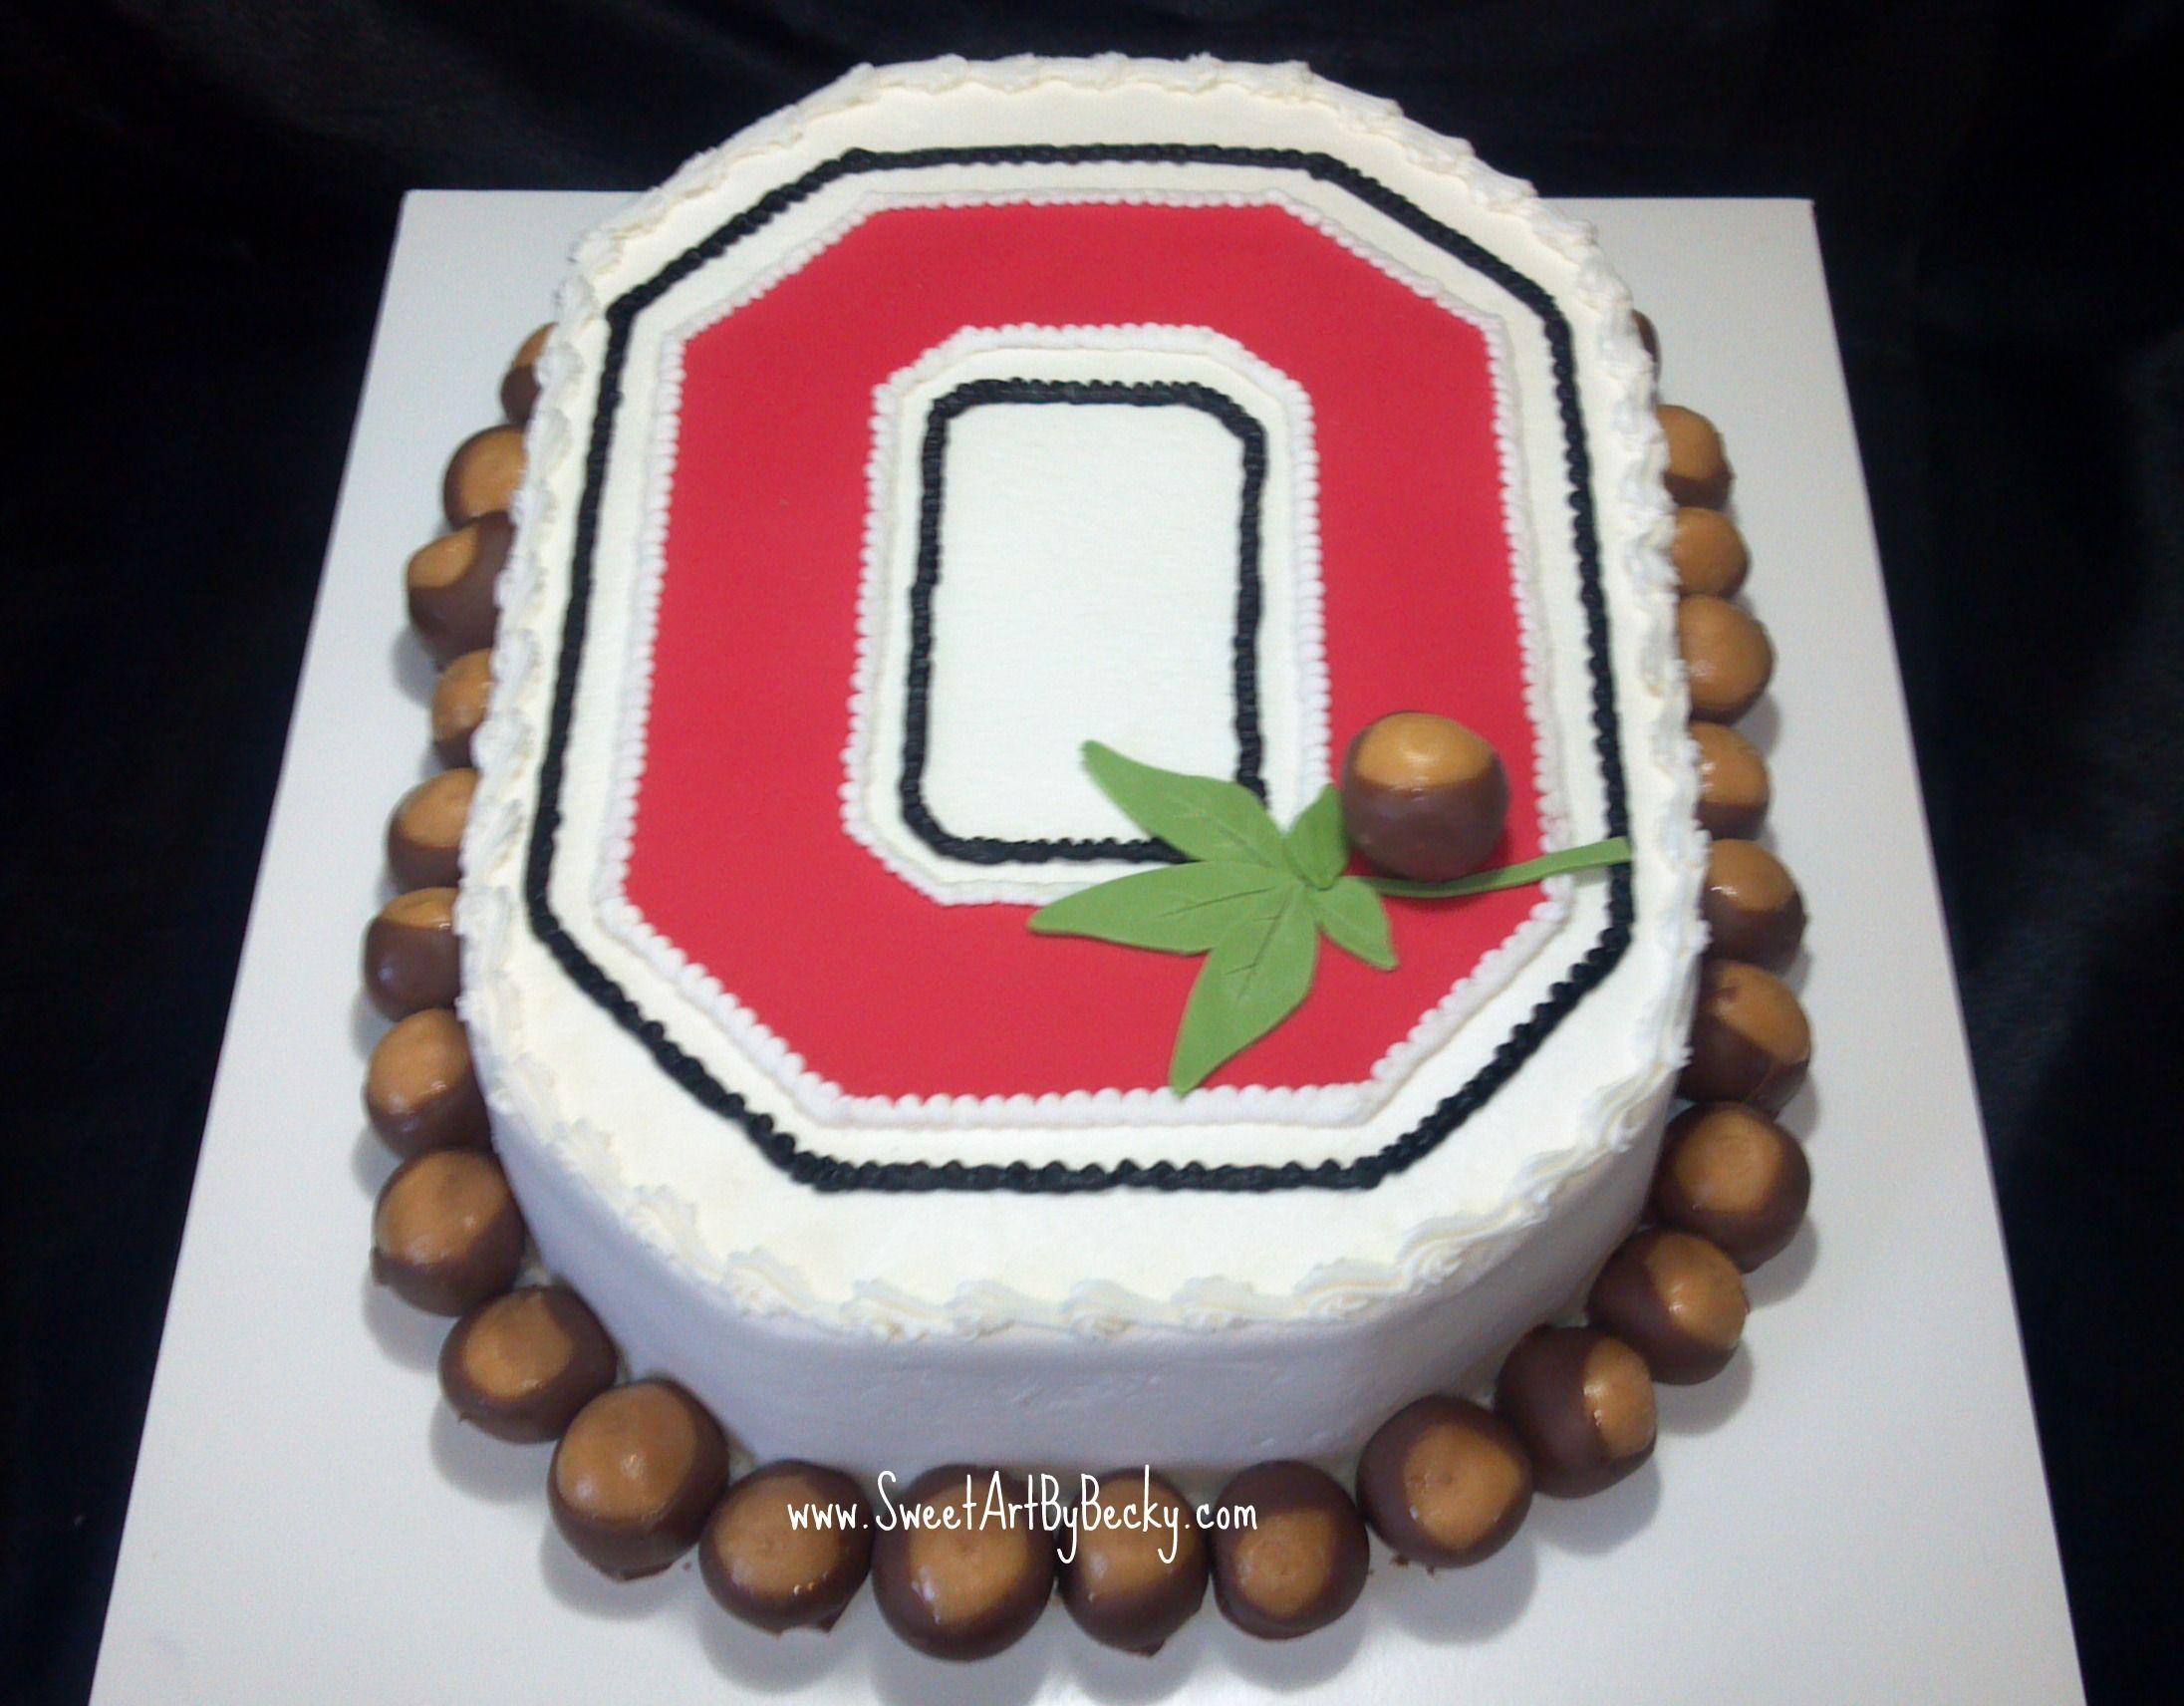 Awesome Ohio State Buckeyes Cake With Images Ohio State Cake